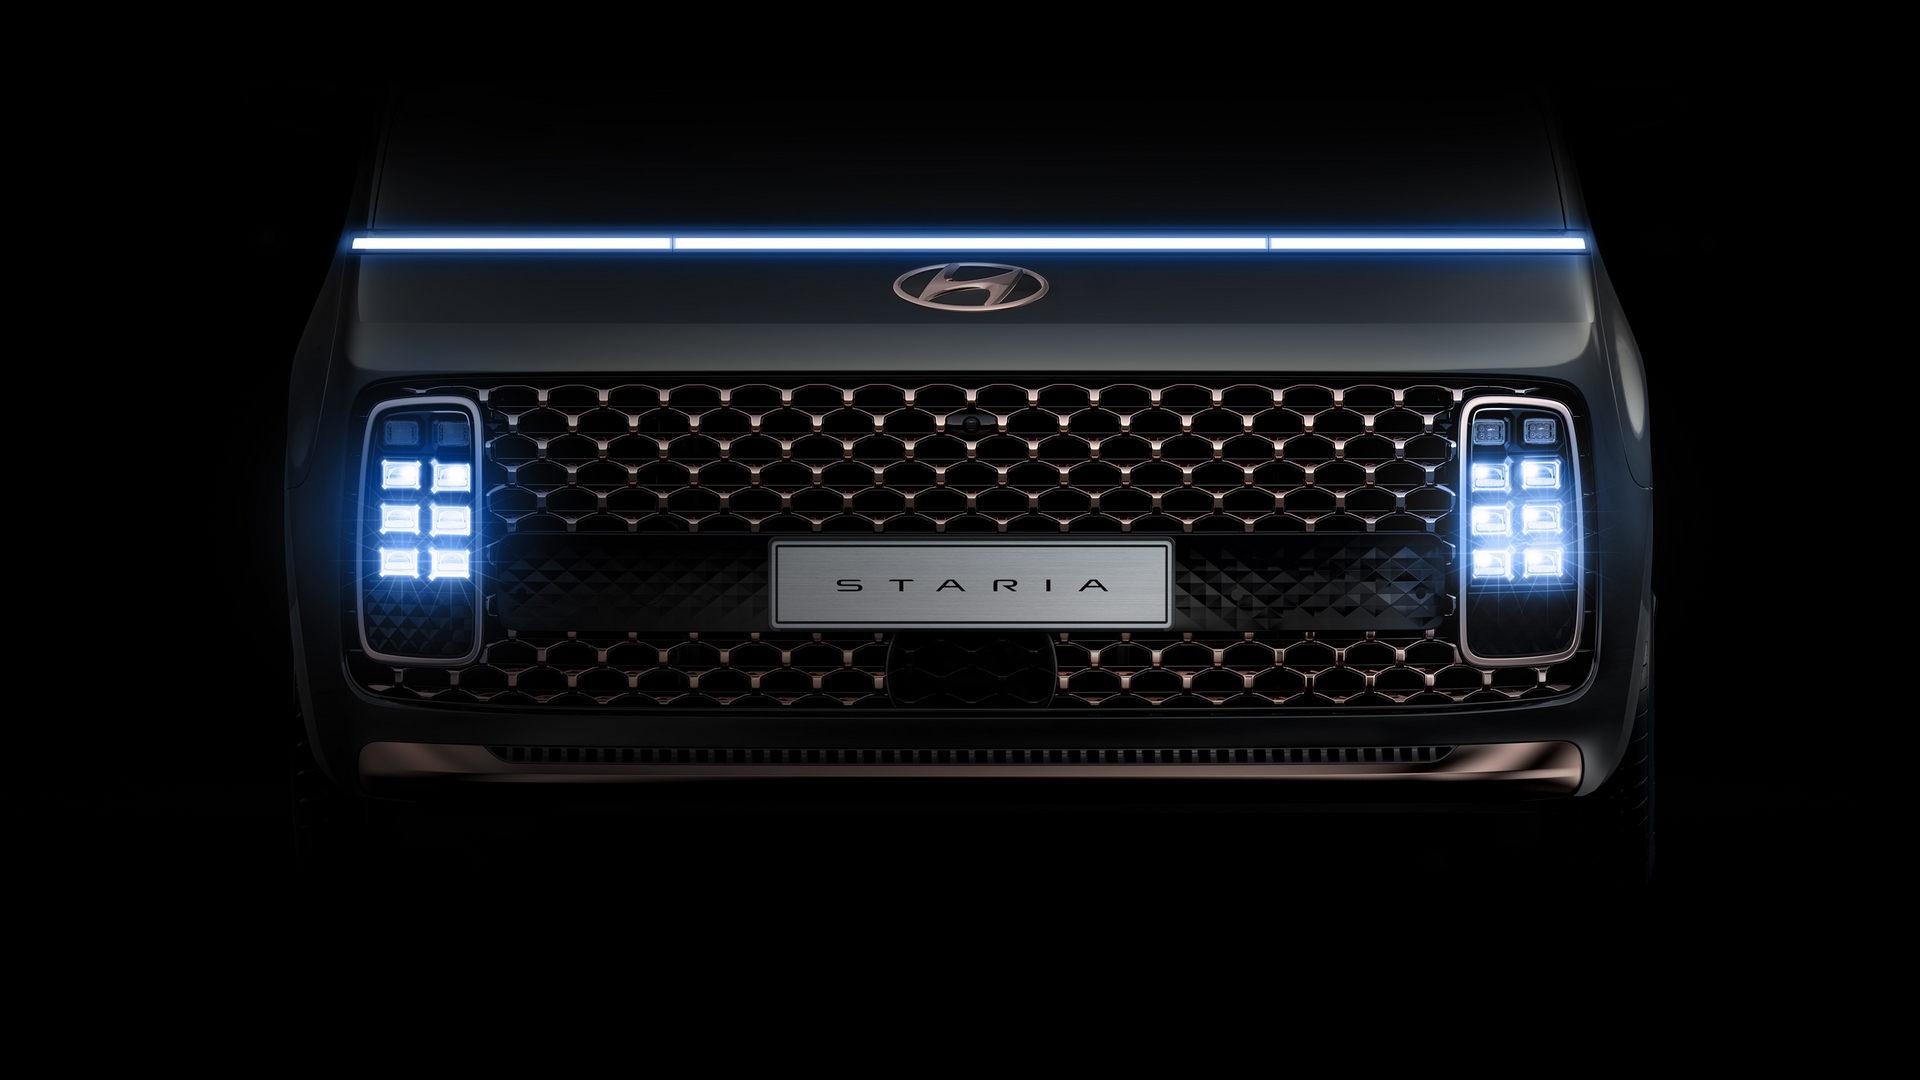 Hyundai-Staria-8 (1).jpg